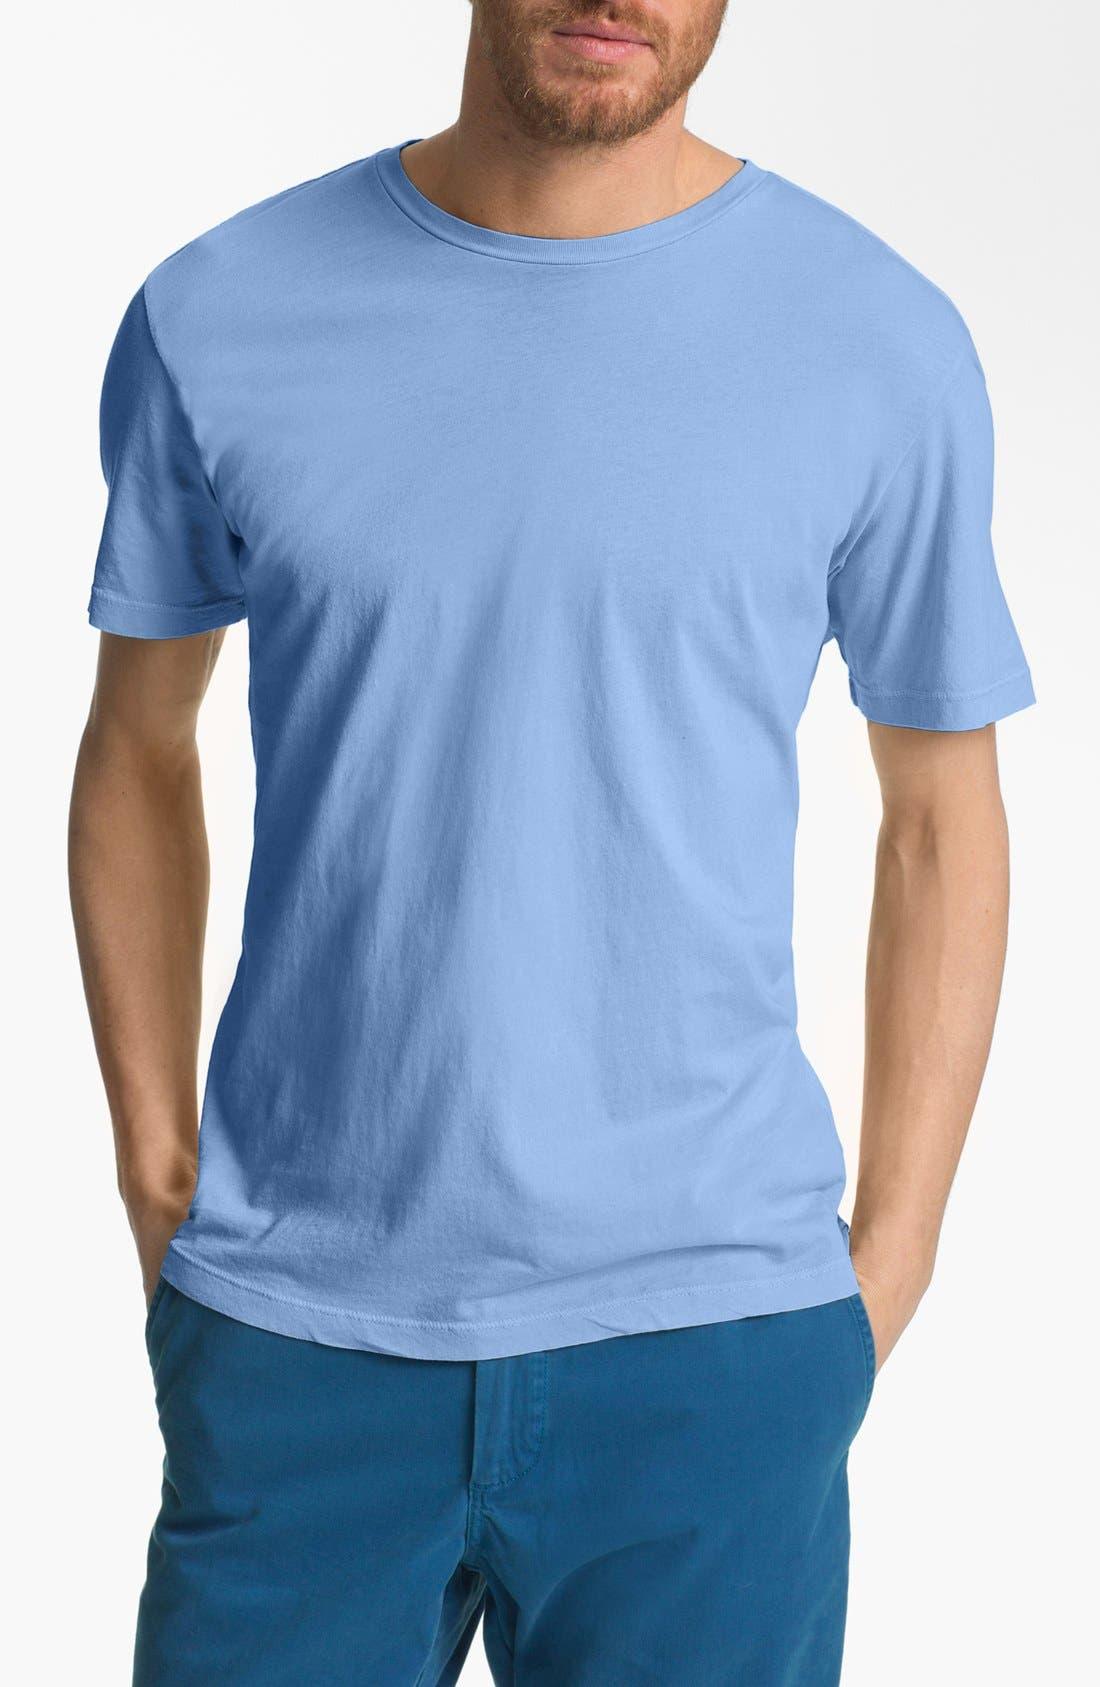 Alternate Image 1 Selected - Wallin & Bros. Trim Fit Crewneck T-Shirt